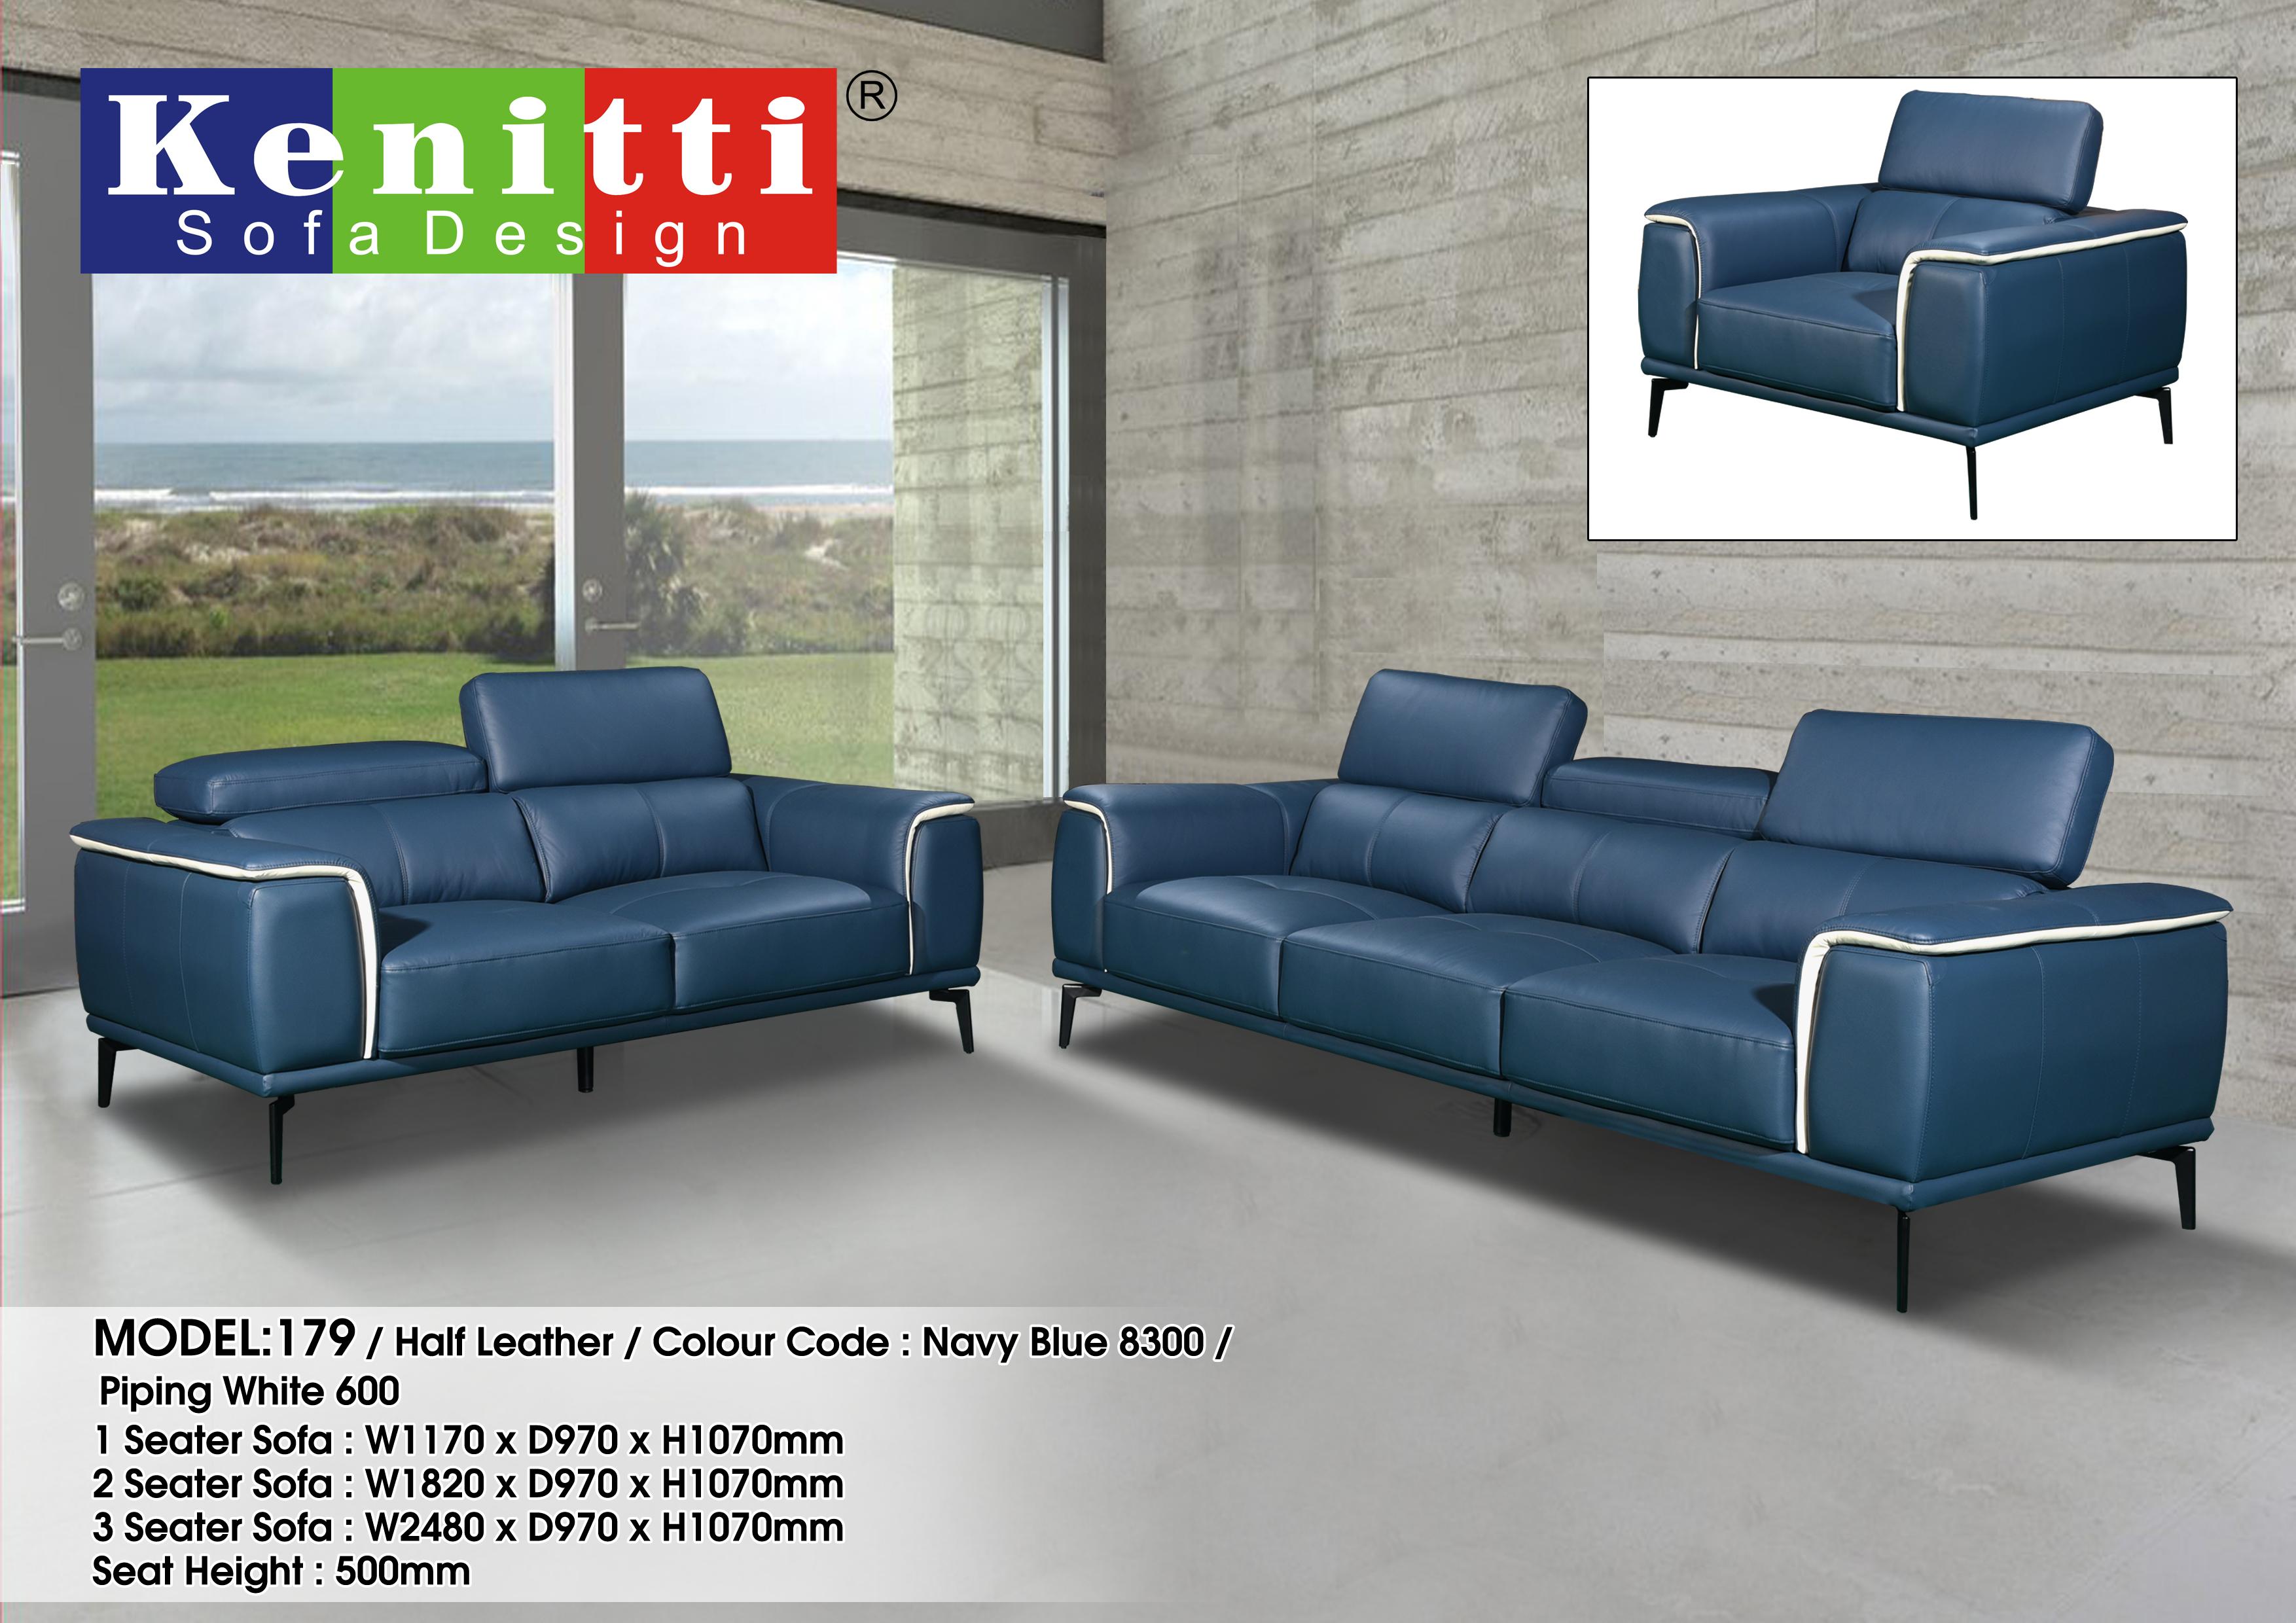 Model - 179 - 1 + 2 + 3 Half Leather